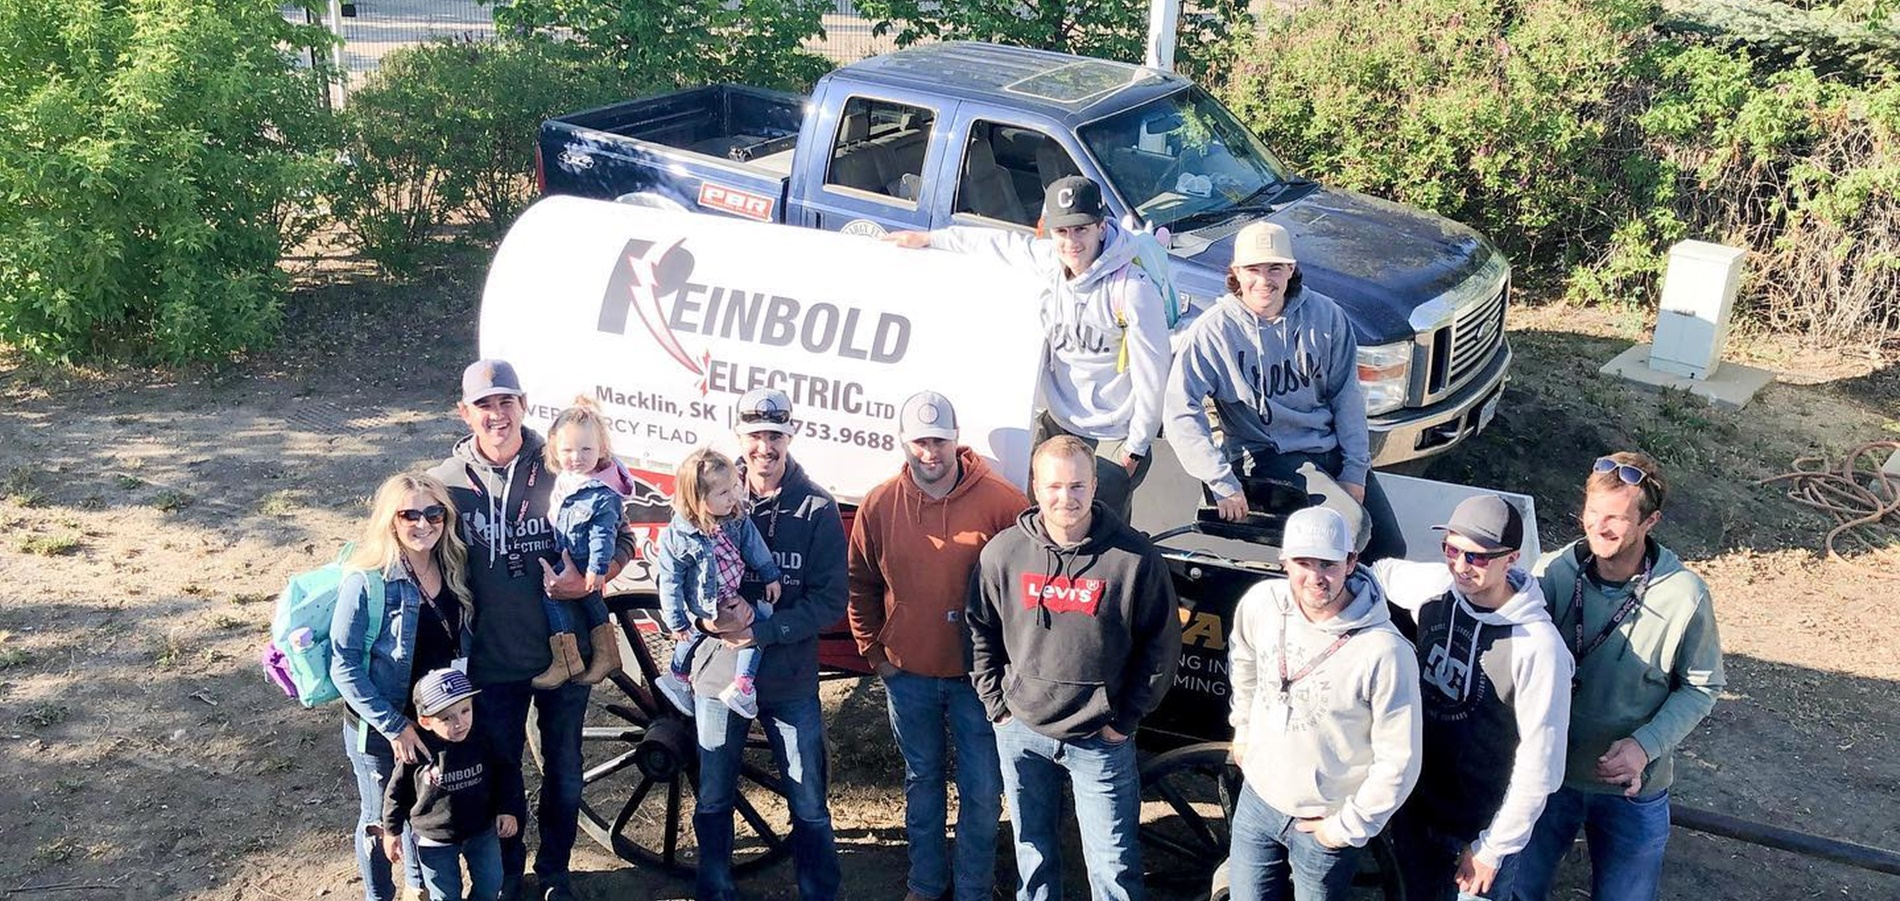 reinbold-electric-team